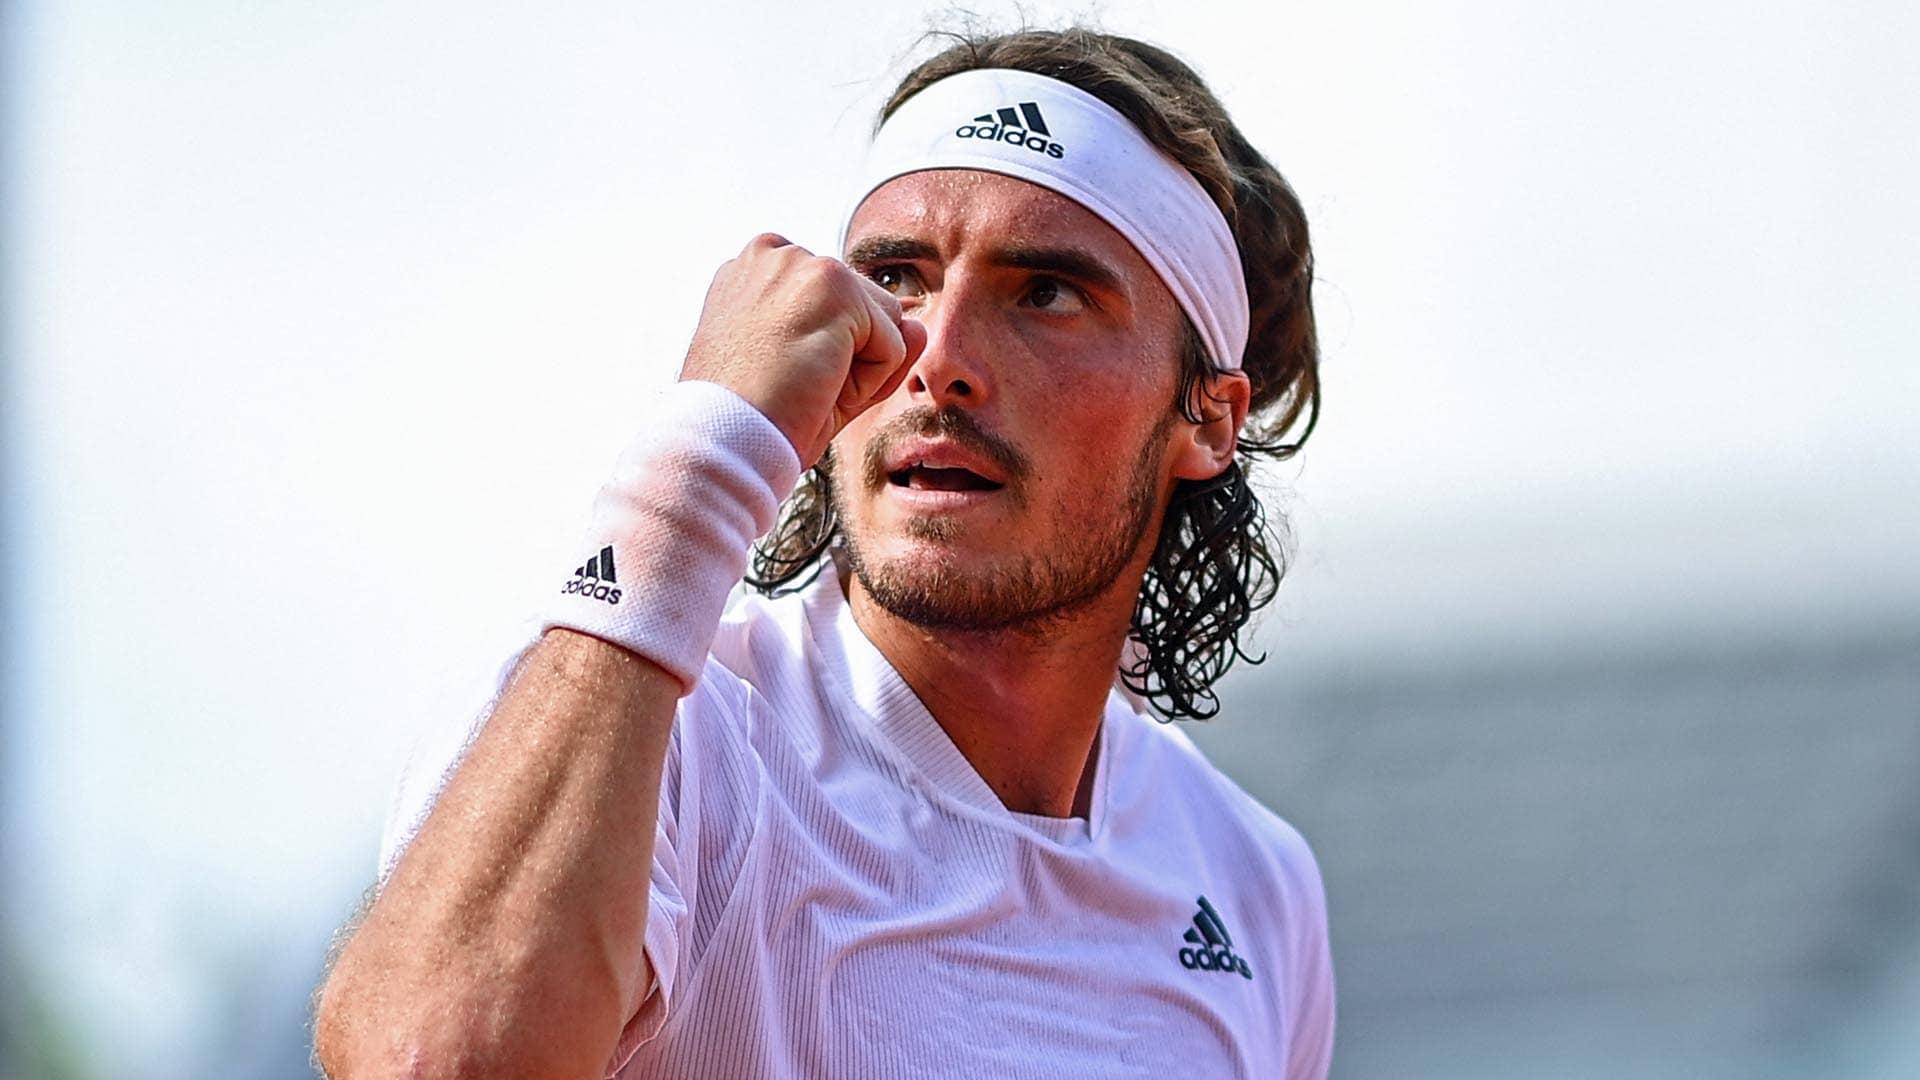 French Open 2021: Stefanos Tsitsipas vs. Pablo Carreno Busta Tennis Prediction